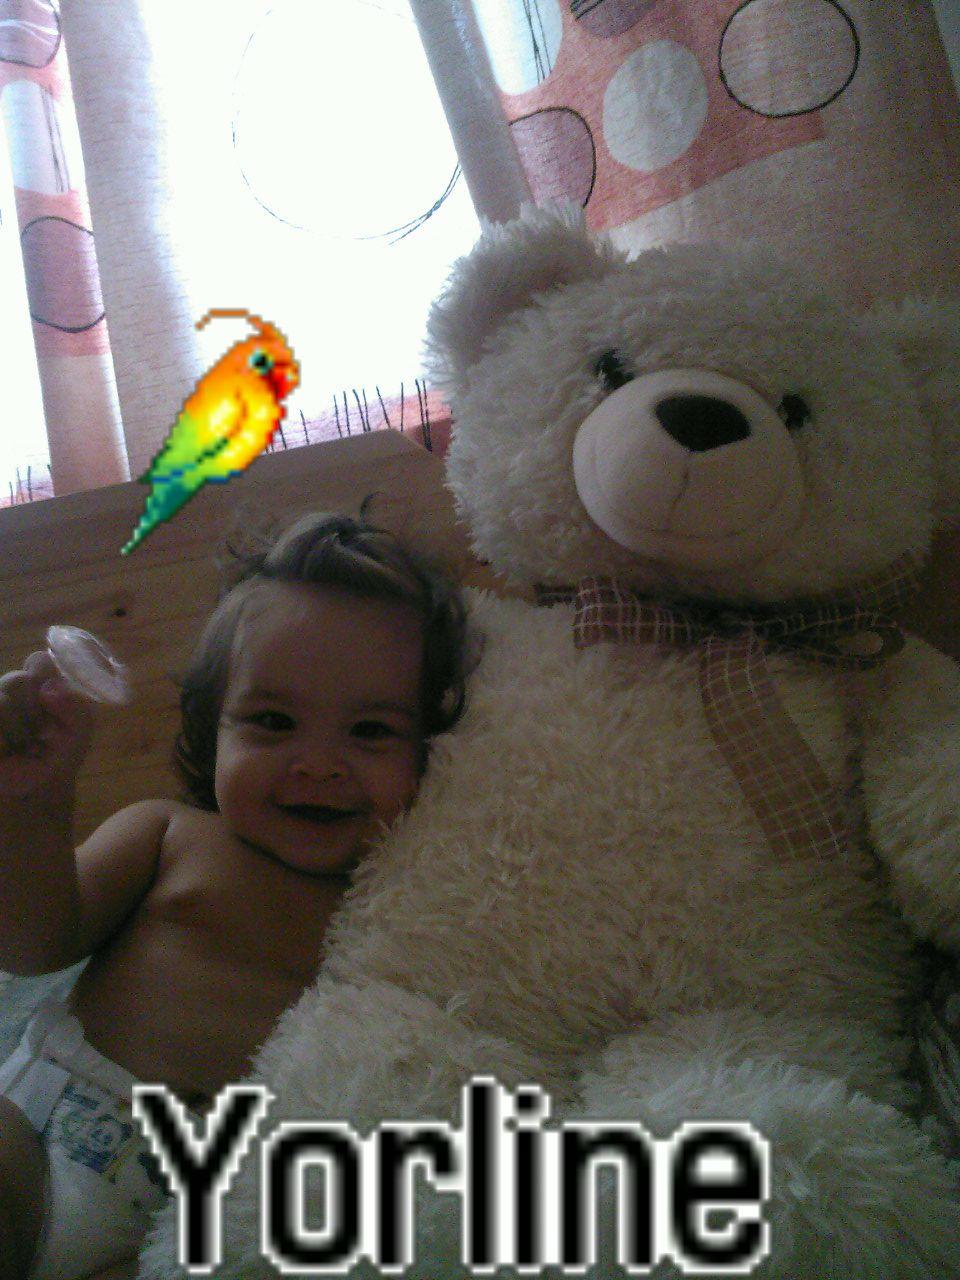 мишка и Yorline. Дети с игрушками